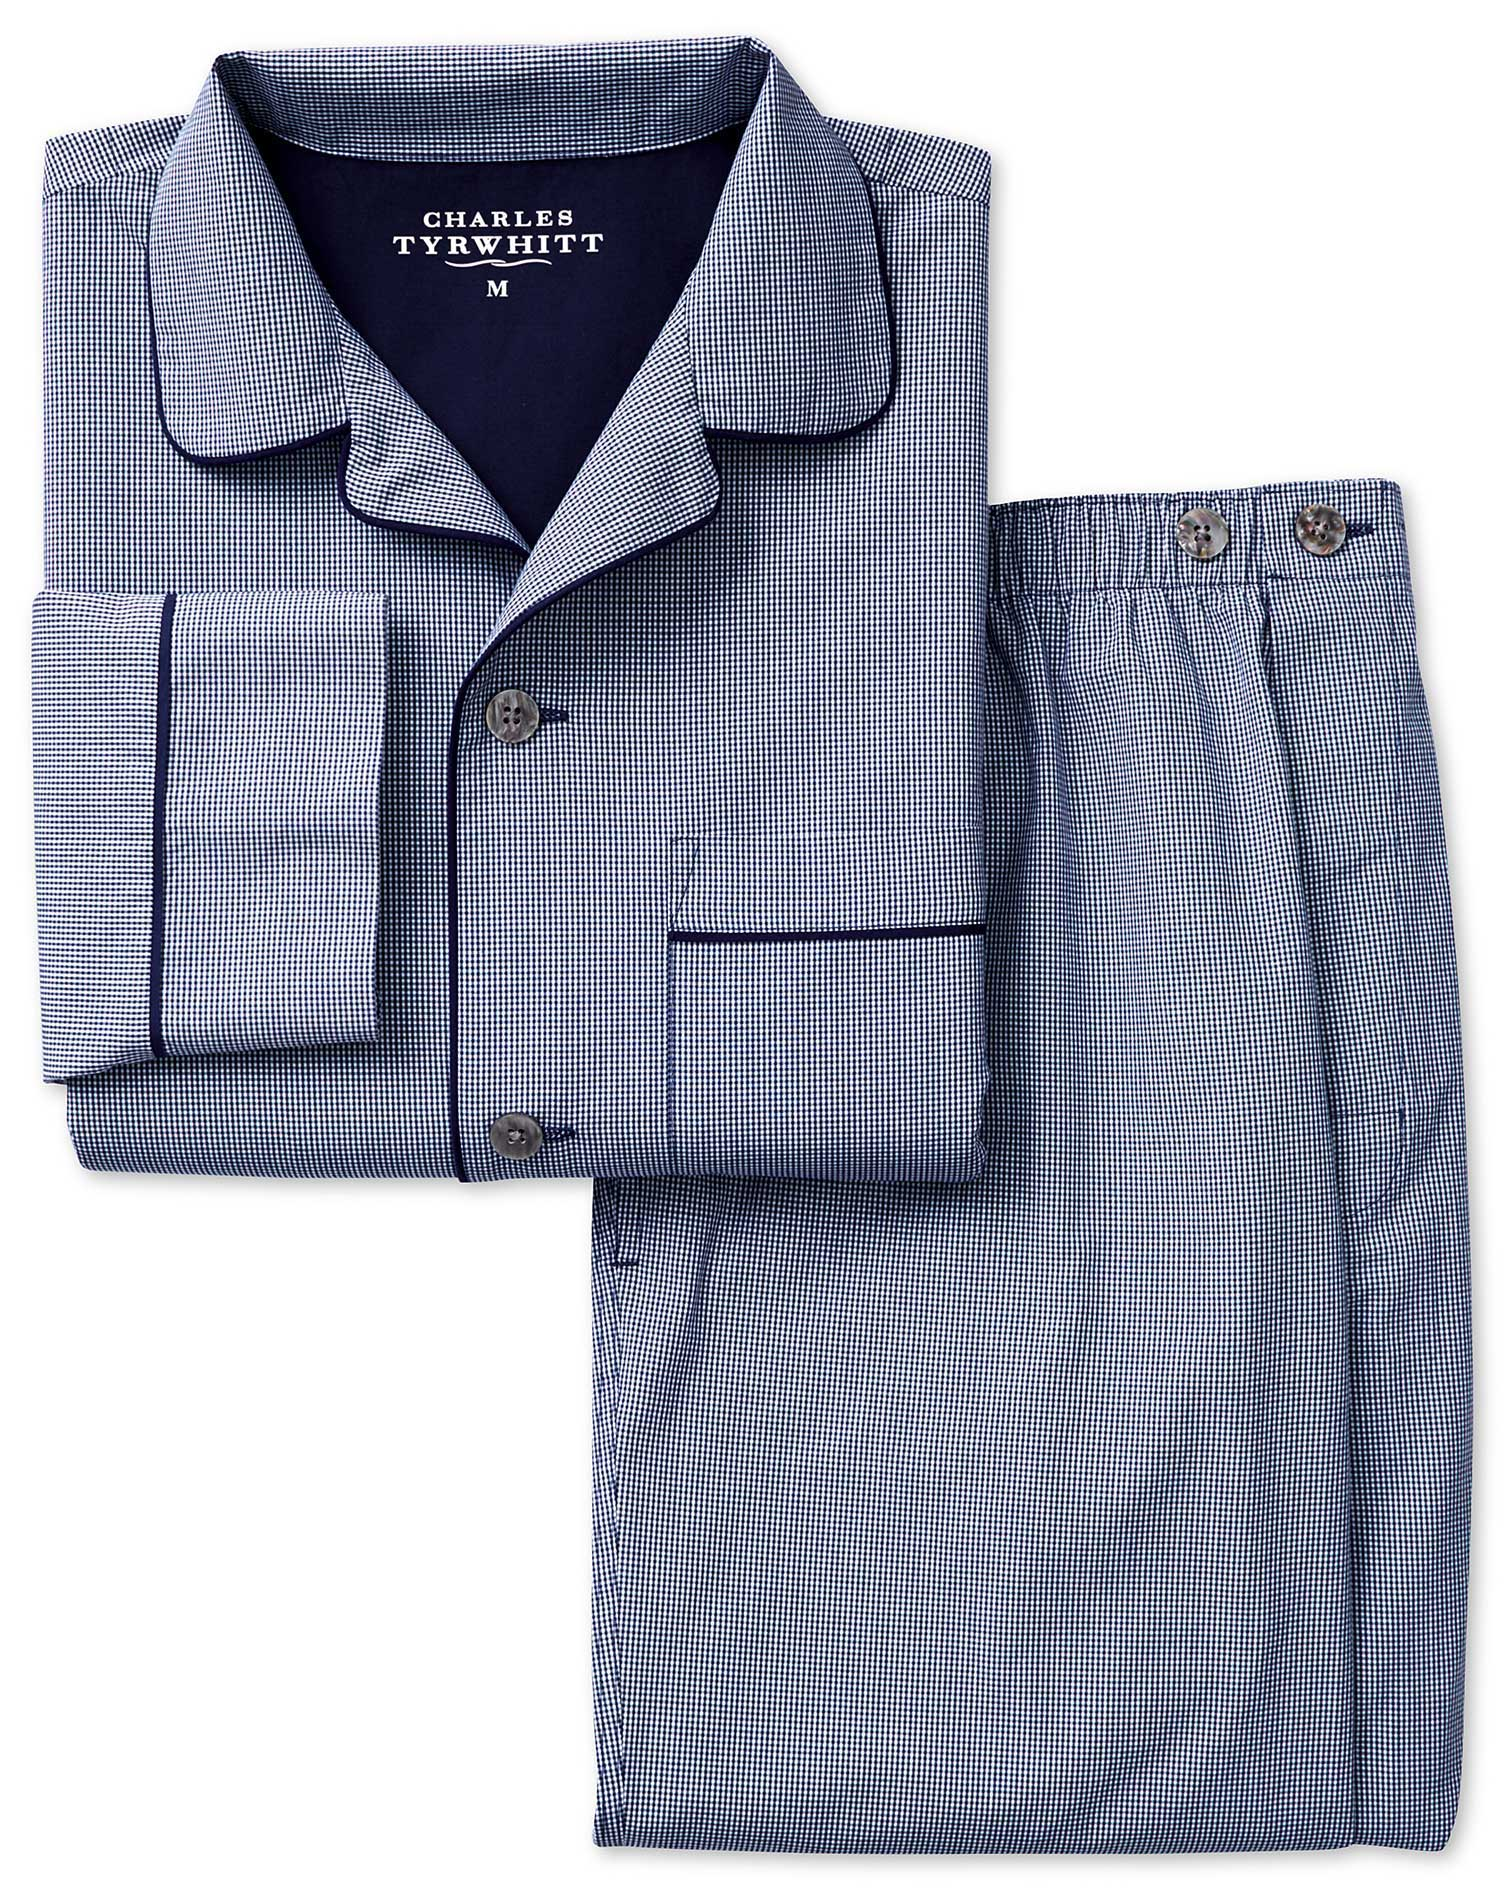 Navy Micro Gingham Cotton Pyjama Set Size Medium by Charles Tyrwhitt